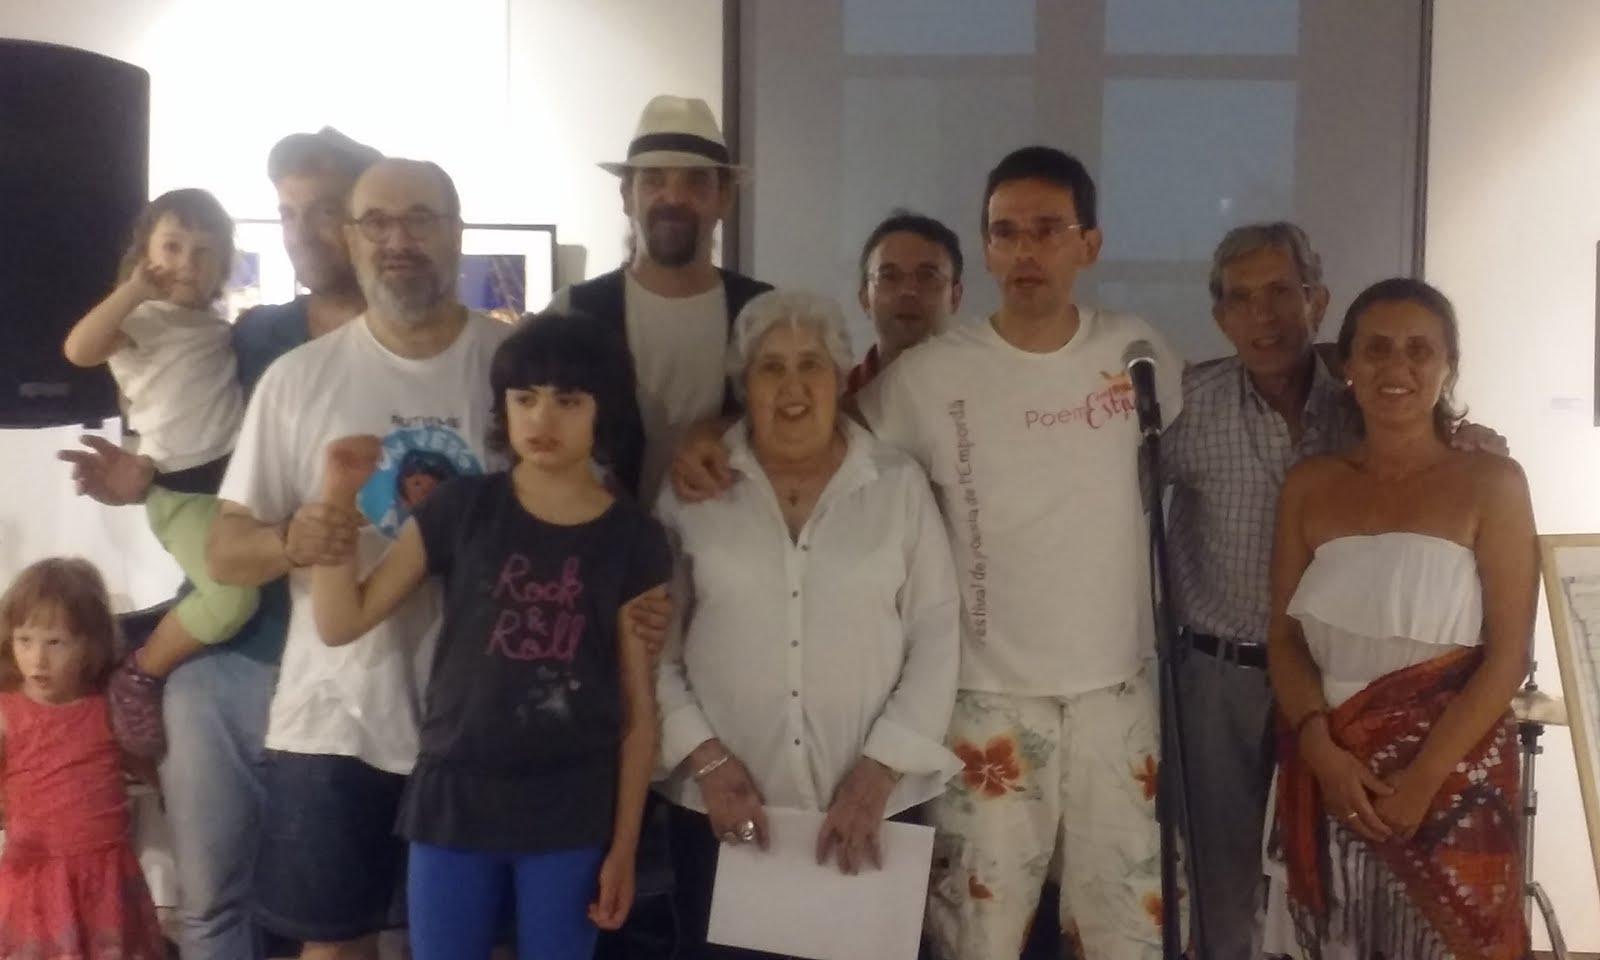 Poemestiu 2015 Eco-Museu la Farinera Castelló d'Empúries